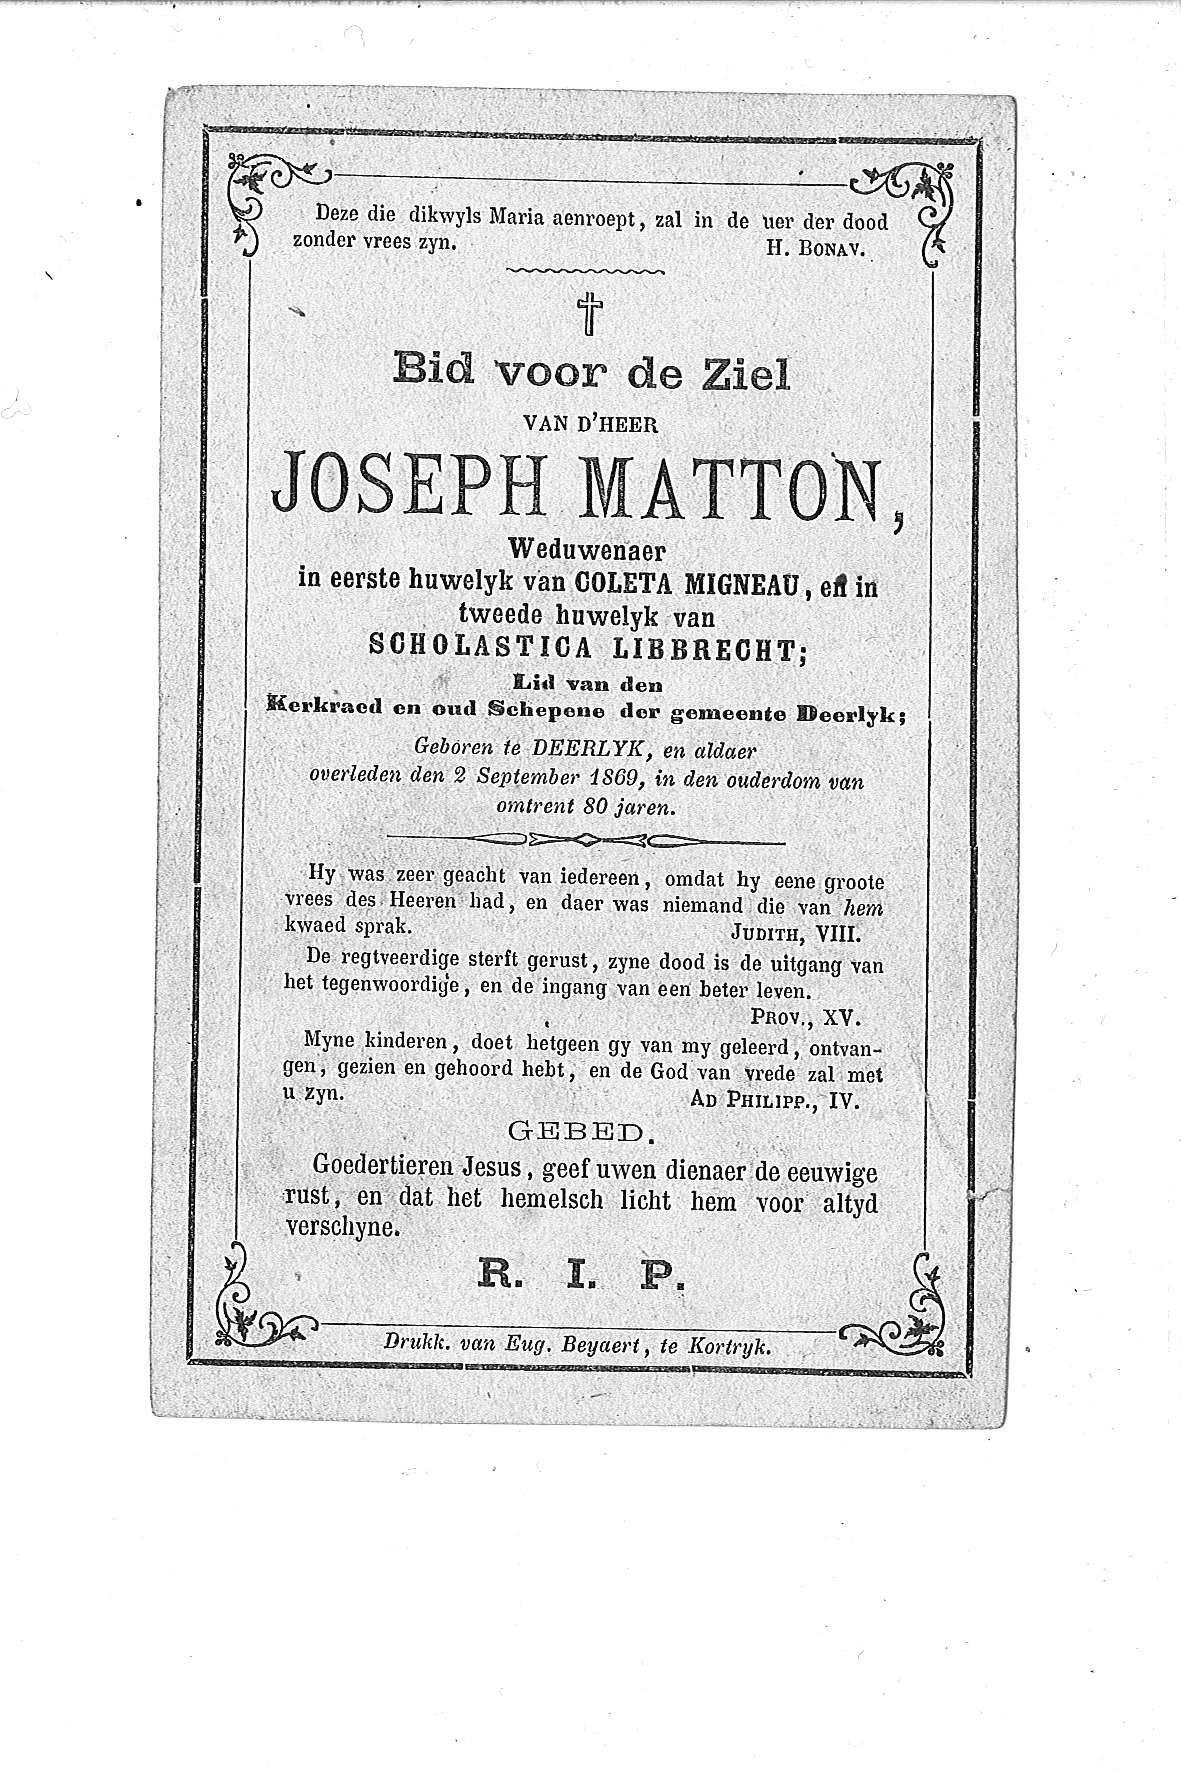 Joseph(1869)20100204132323_00026.jpg